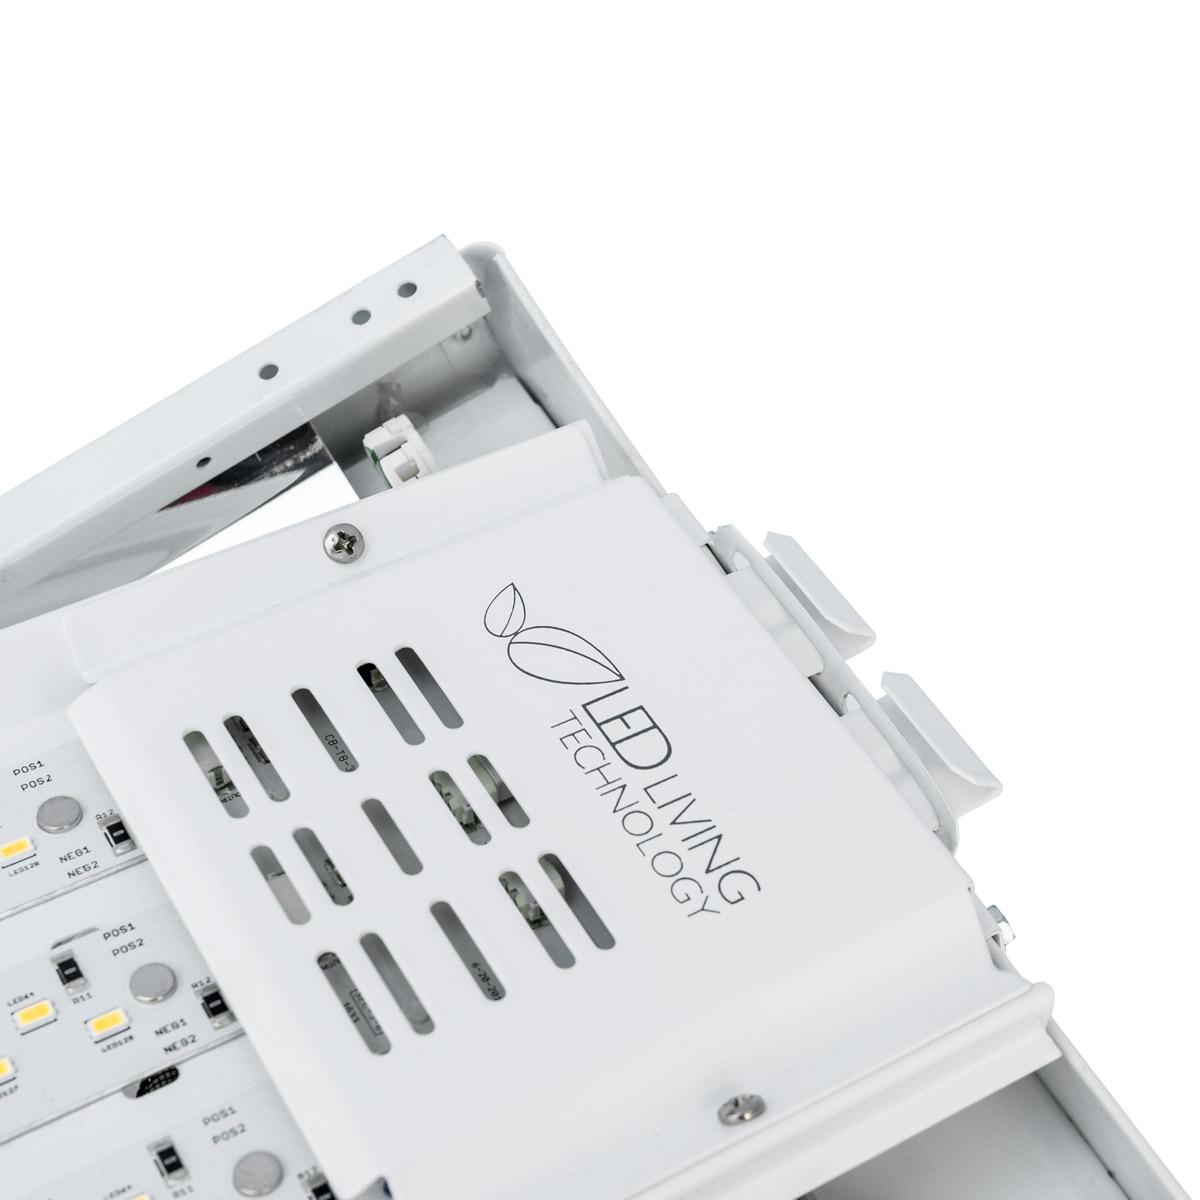 Tfive Linear High Bay LED Retrofit Kit